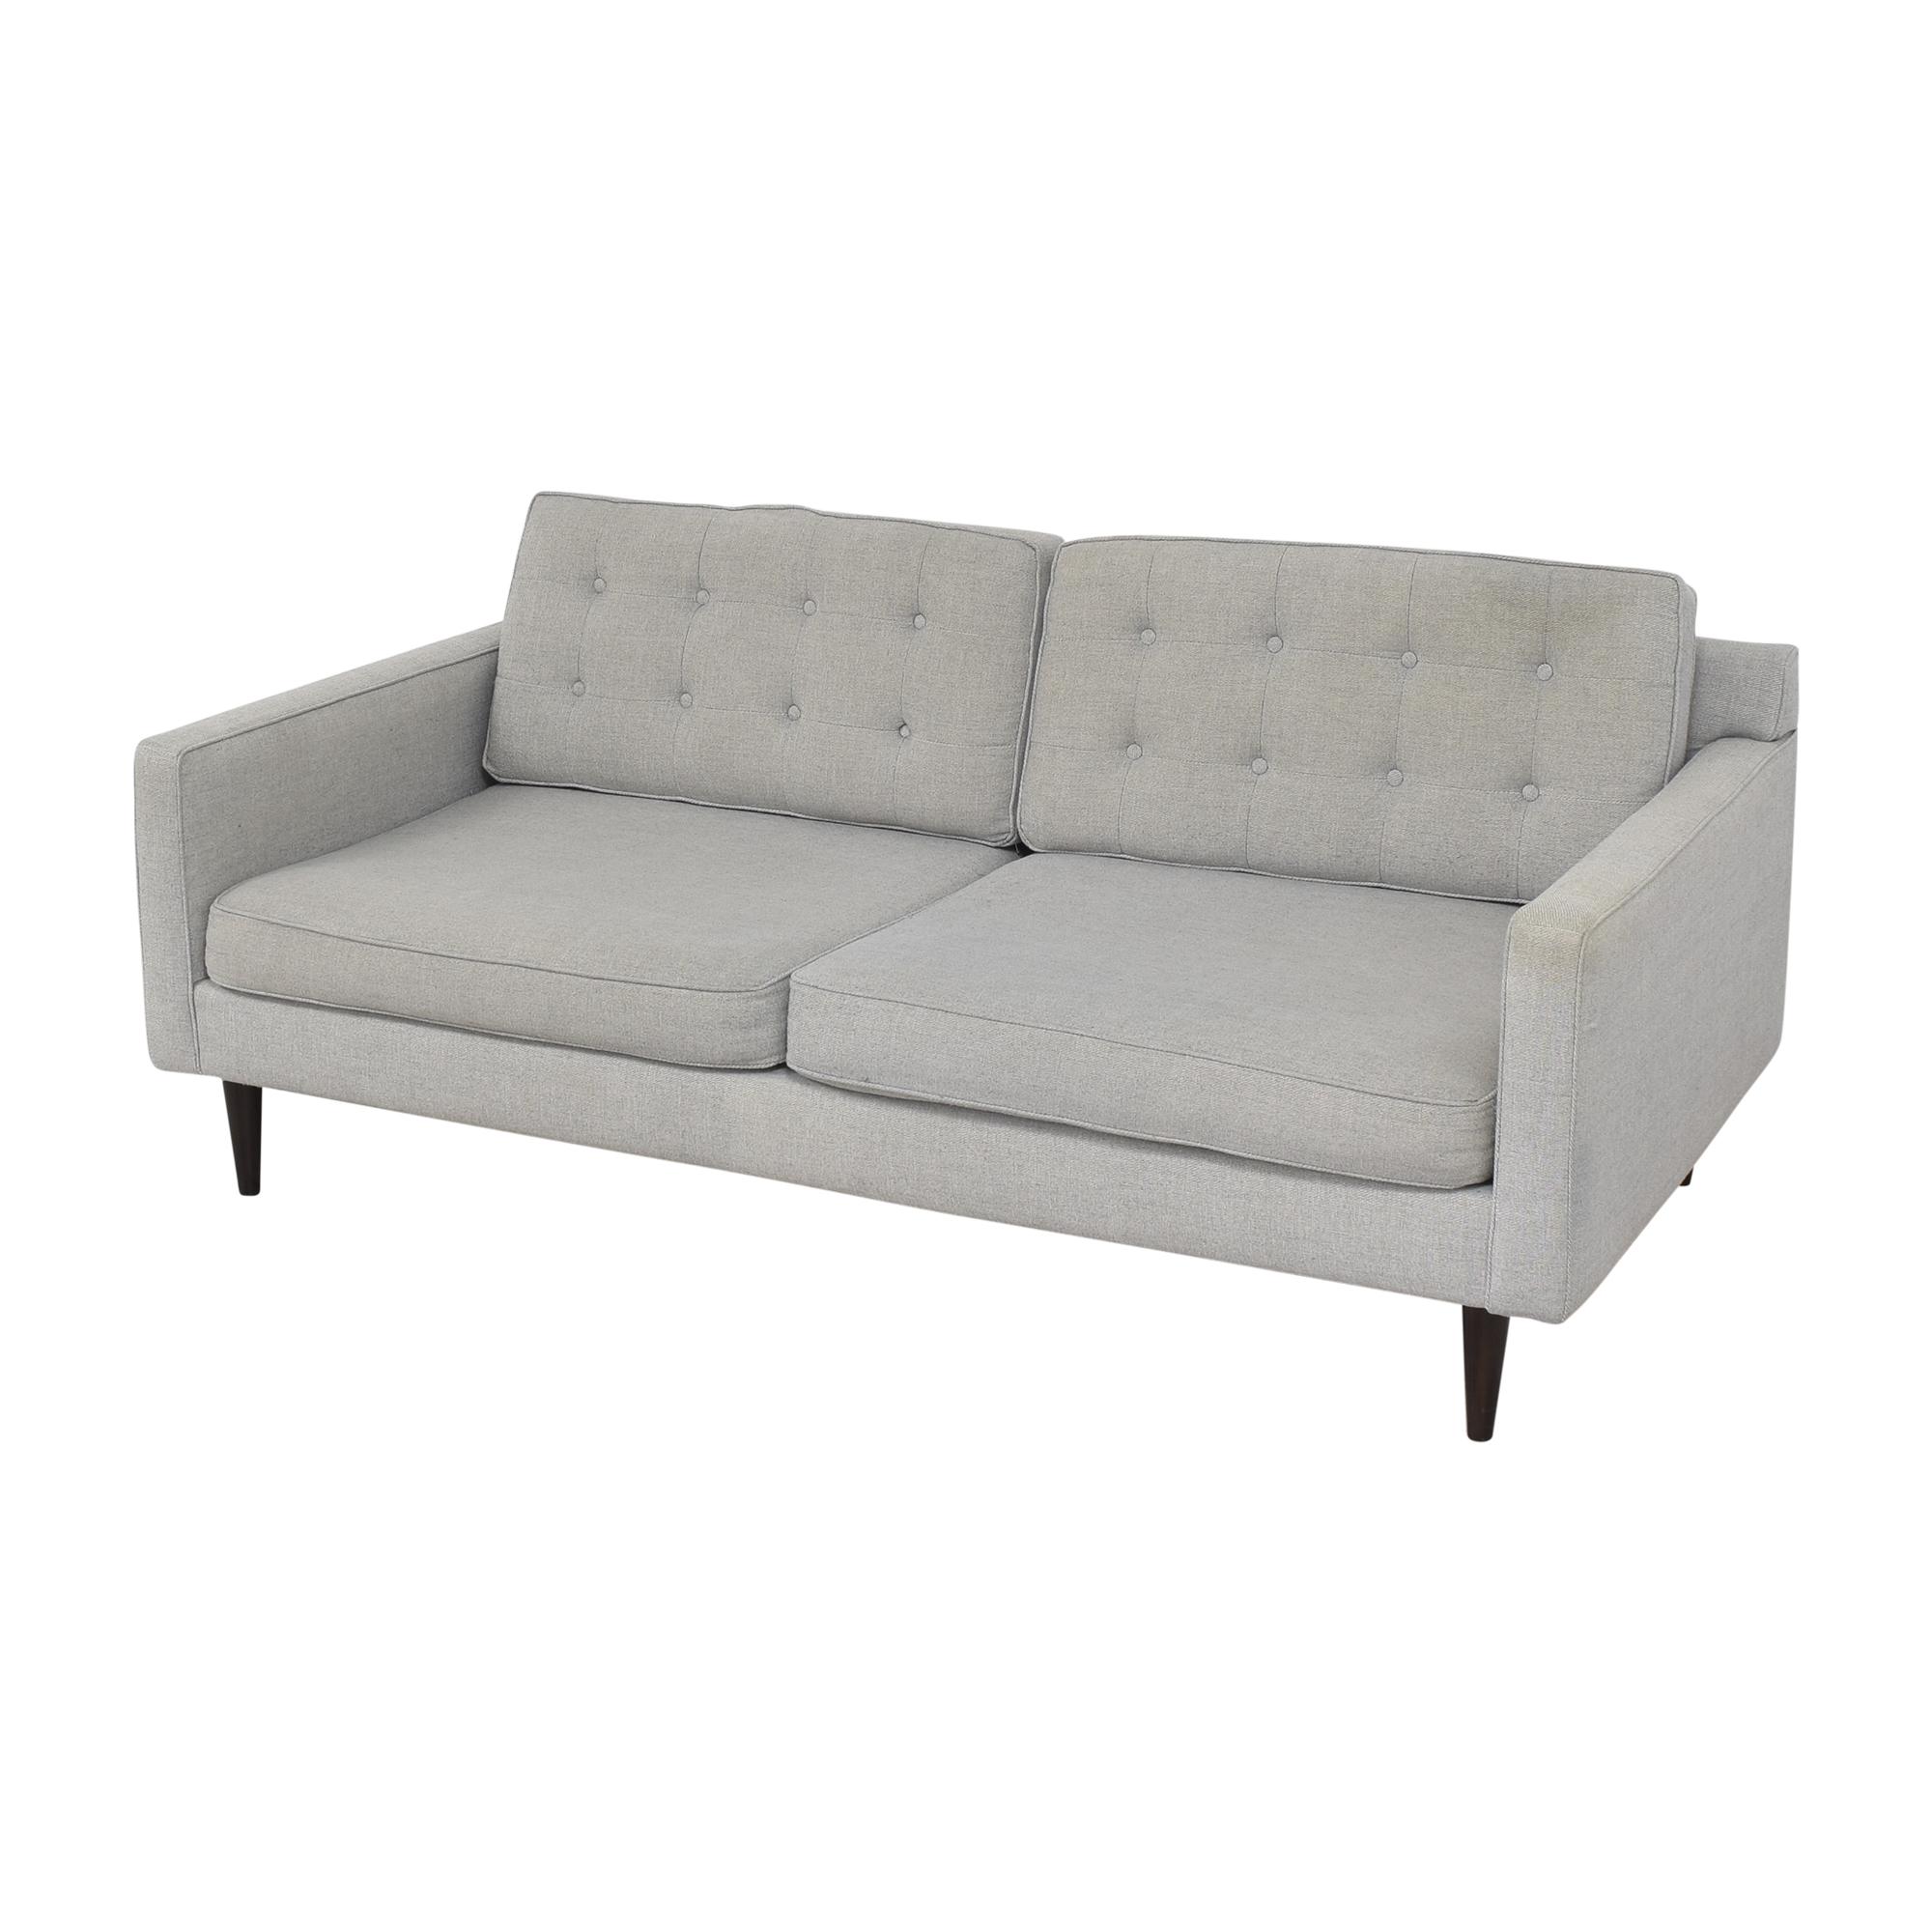 West Elm West Elm Drake Mid Century Sofa price